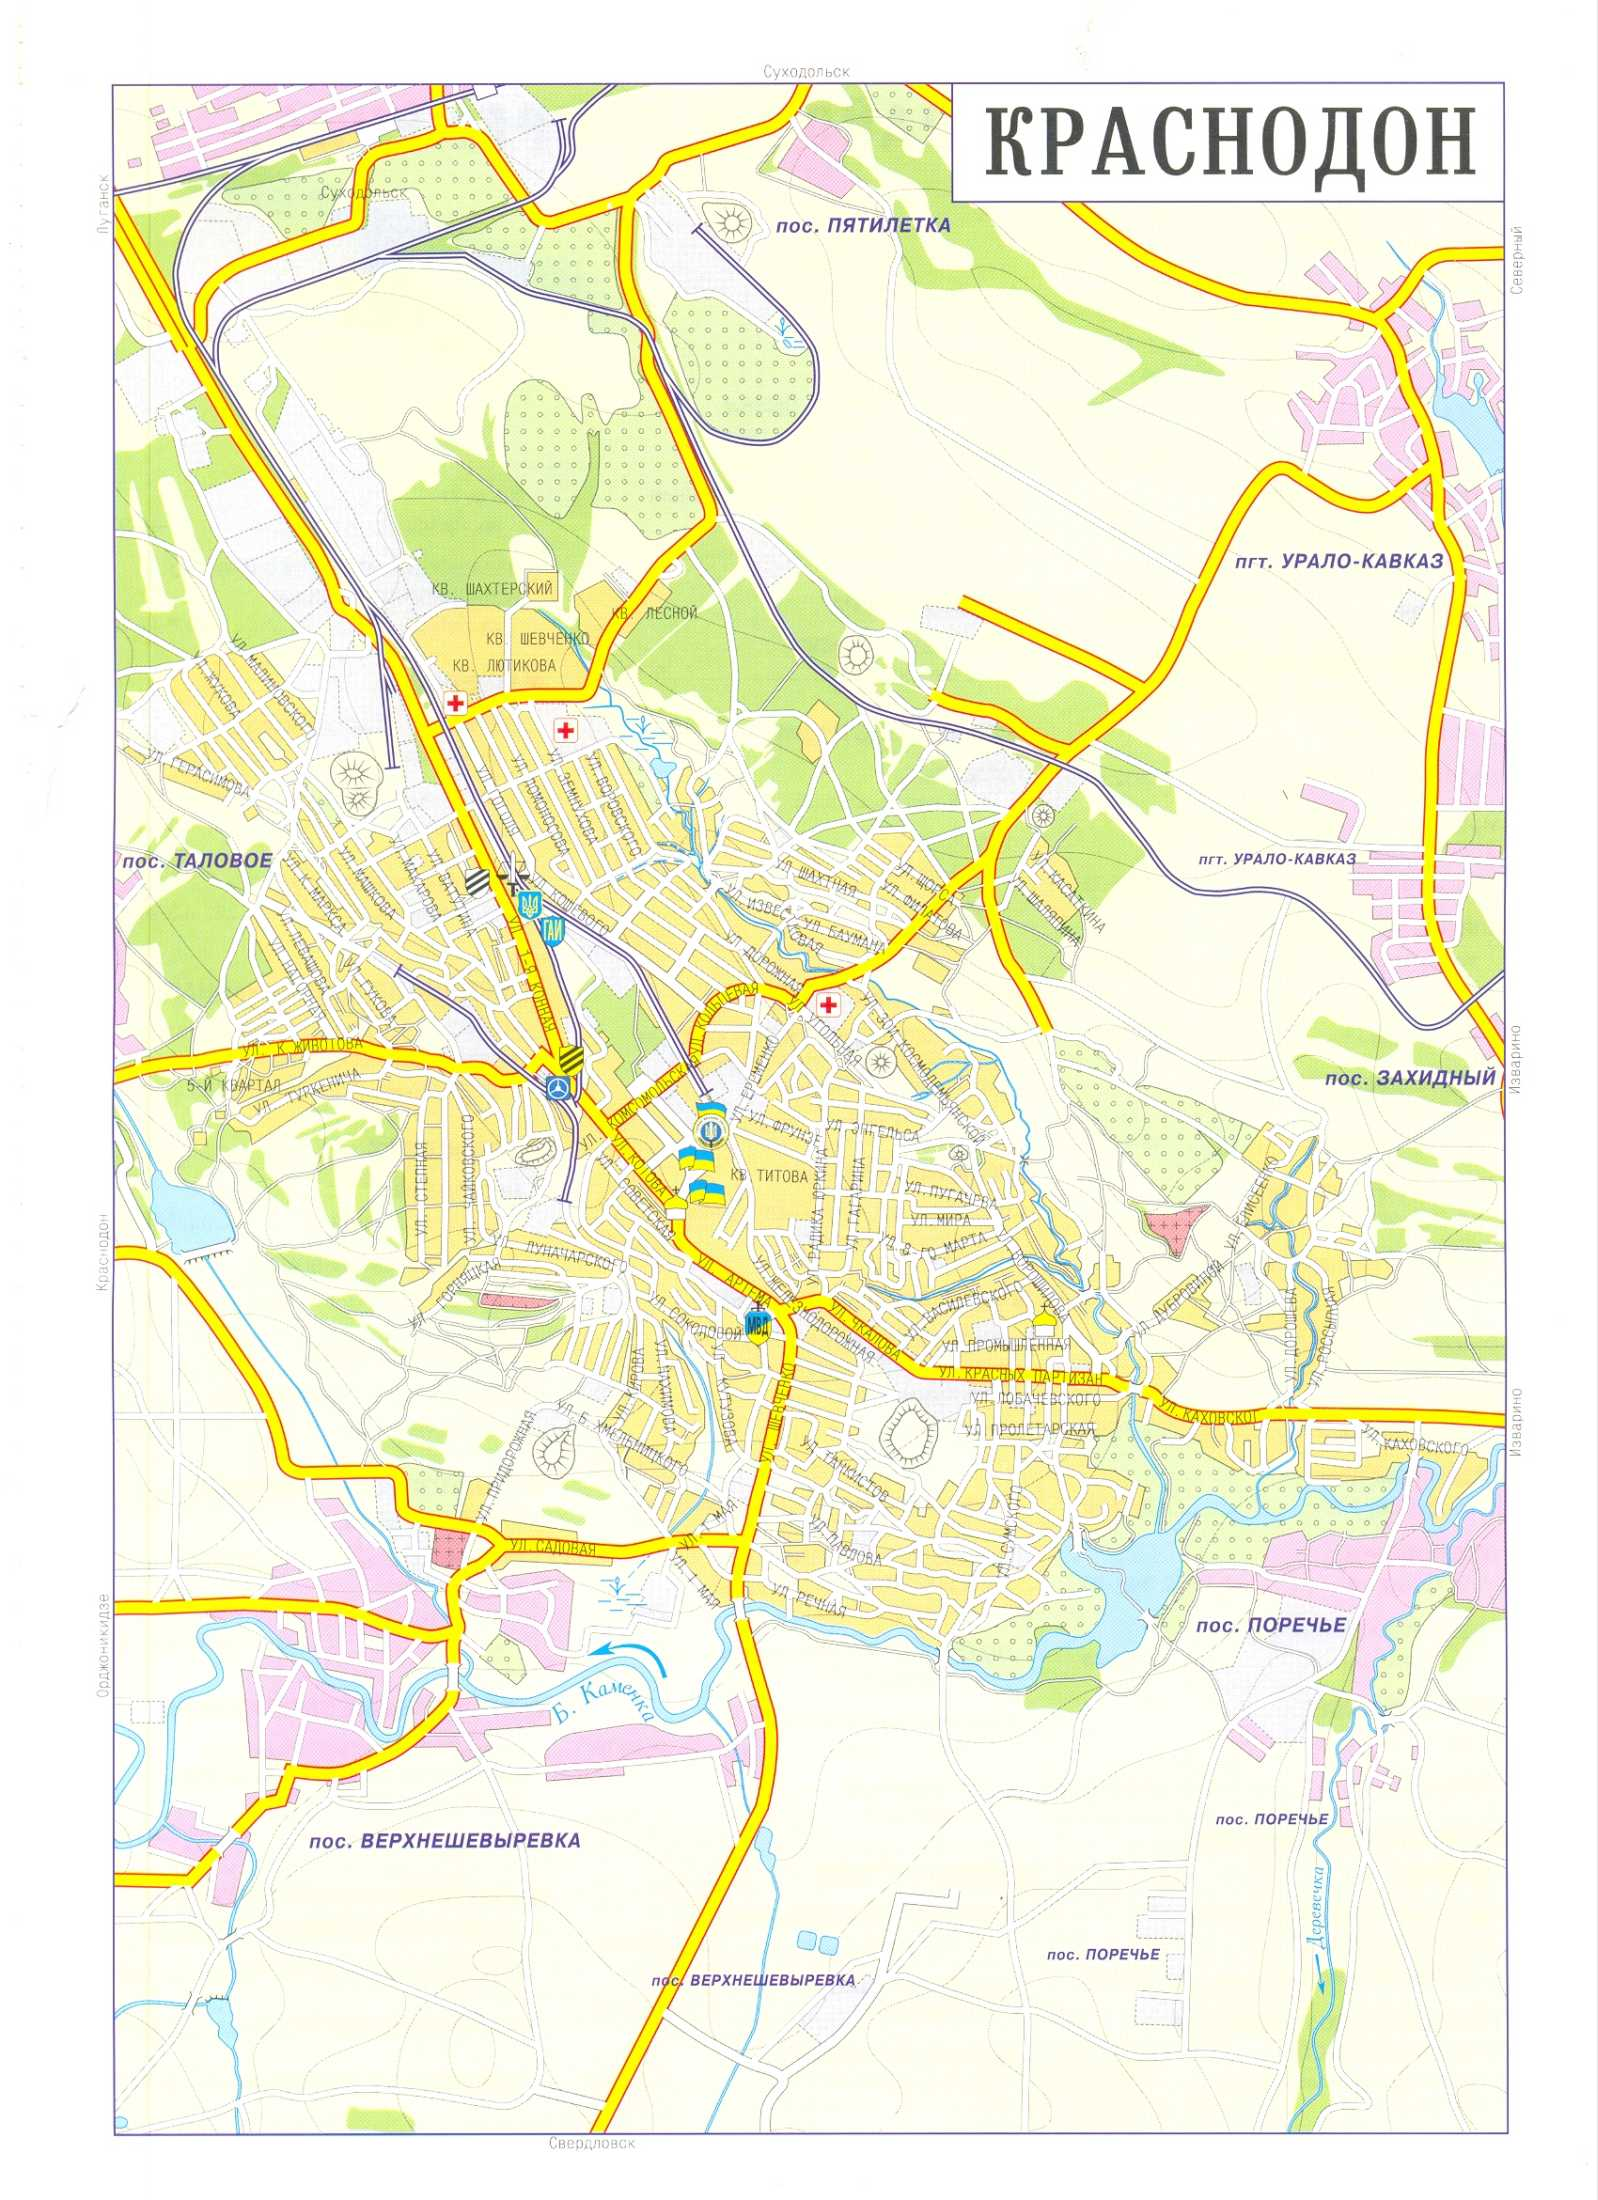 Карта города Краснодон